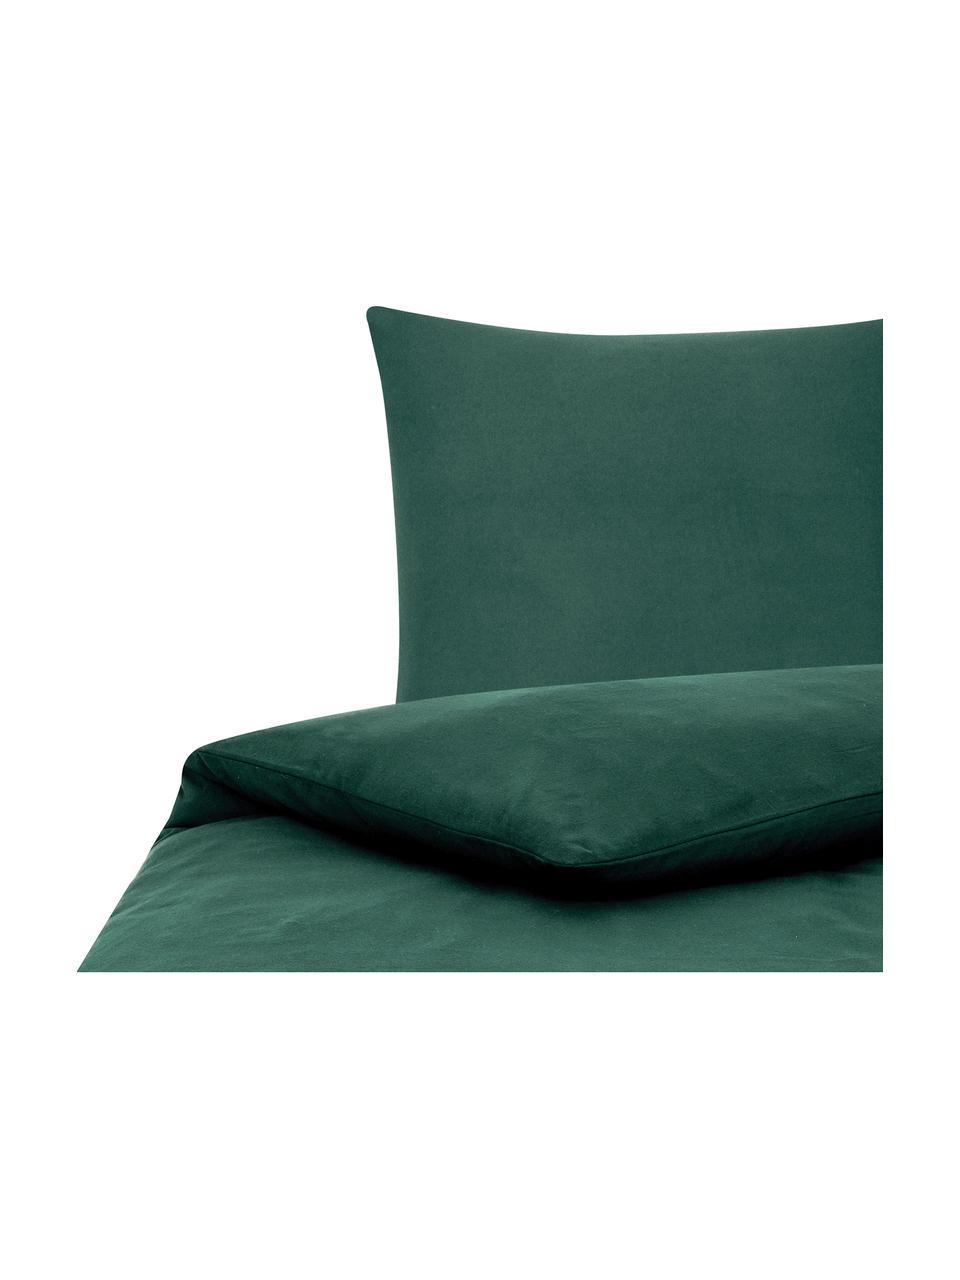 Flanell-Bettwäsche Biba in Waldgrün, Webart: Flanell Flanell ist ein k, Waldgrün, 135 x 200 cm + 1 Kissen 80 x 80 cm